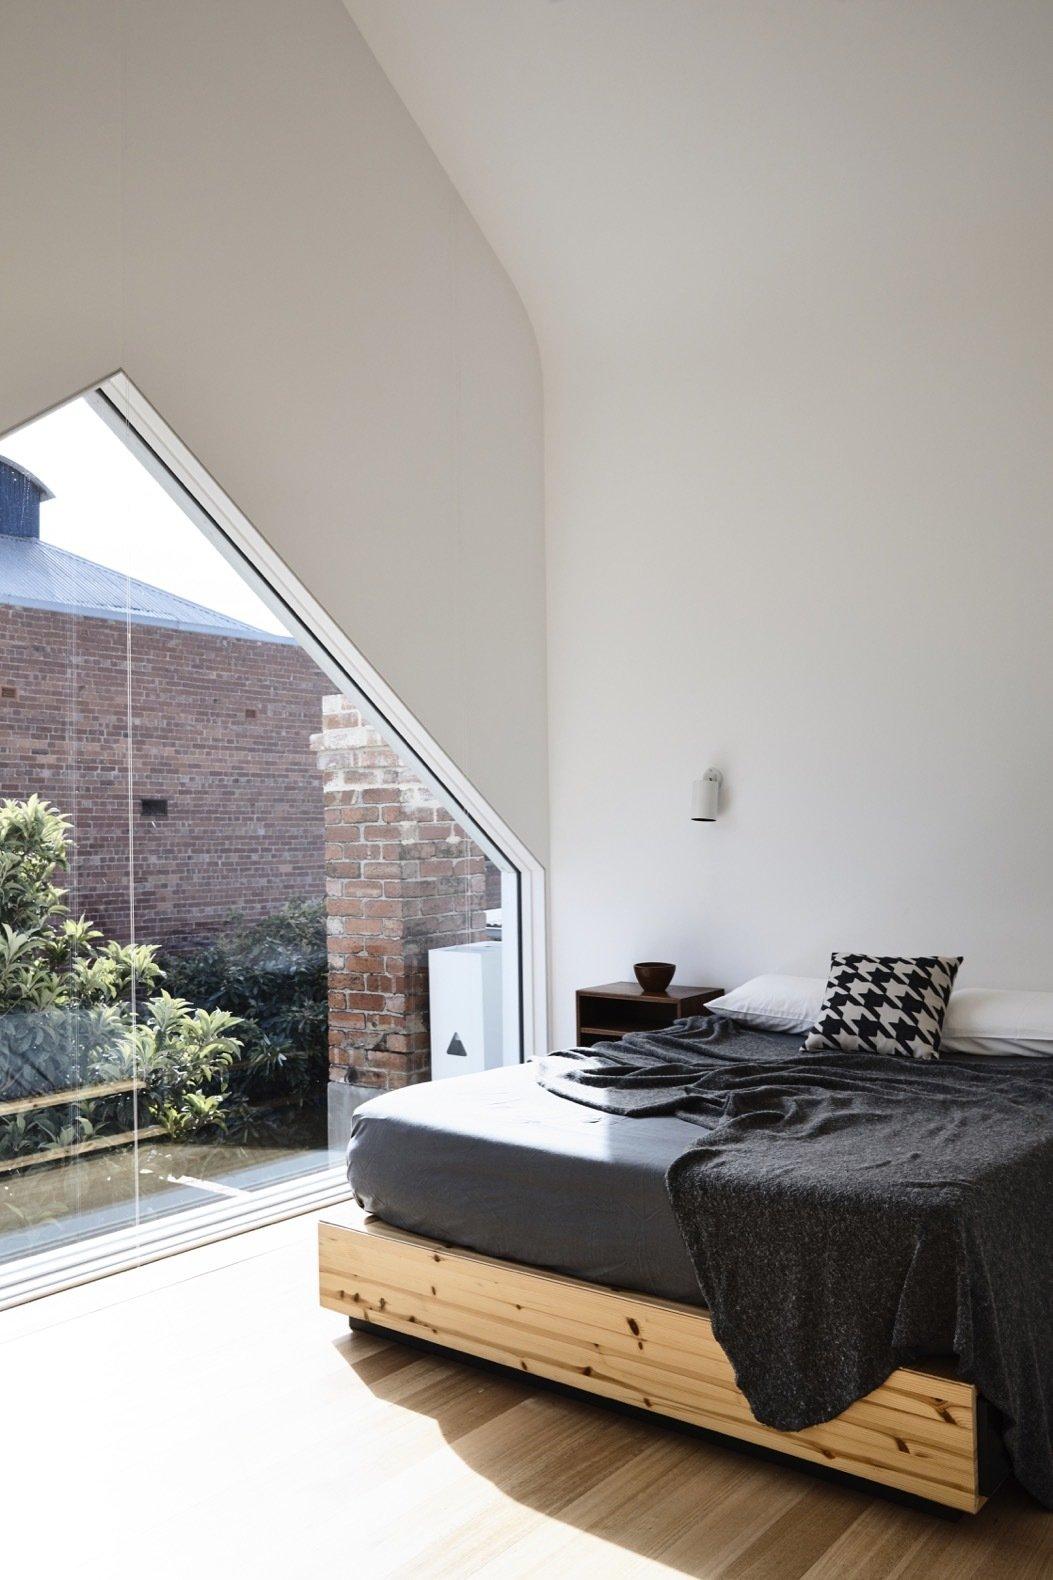 Grant House master bedroom